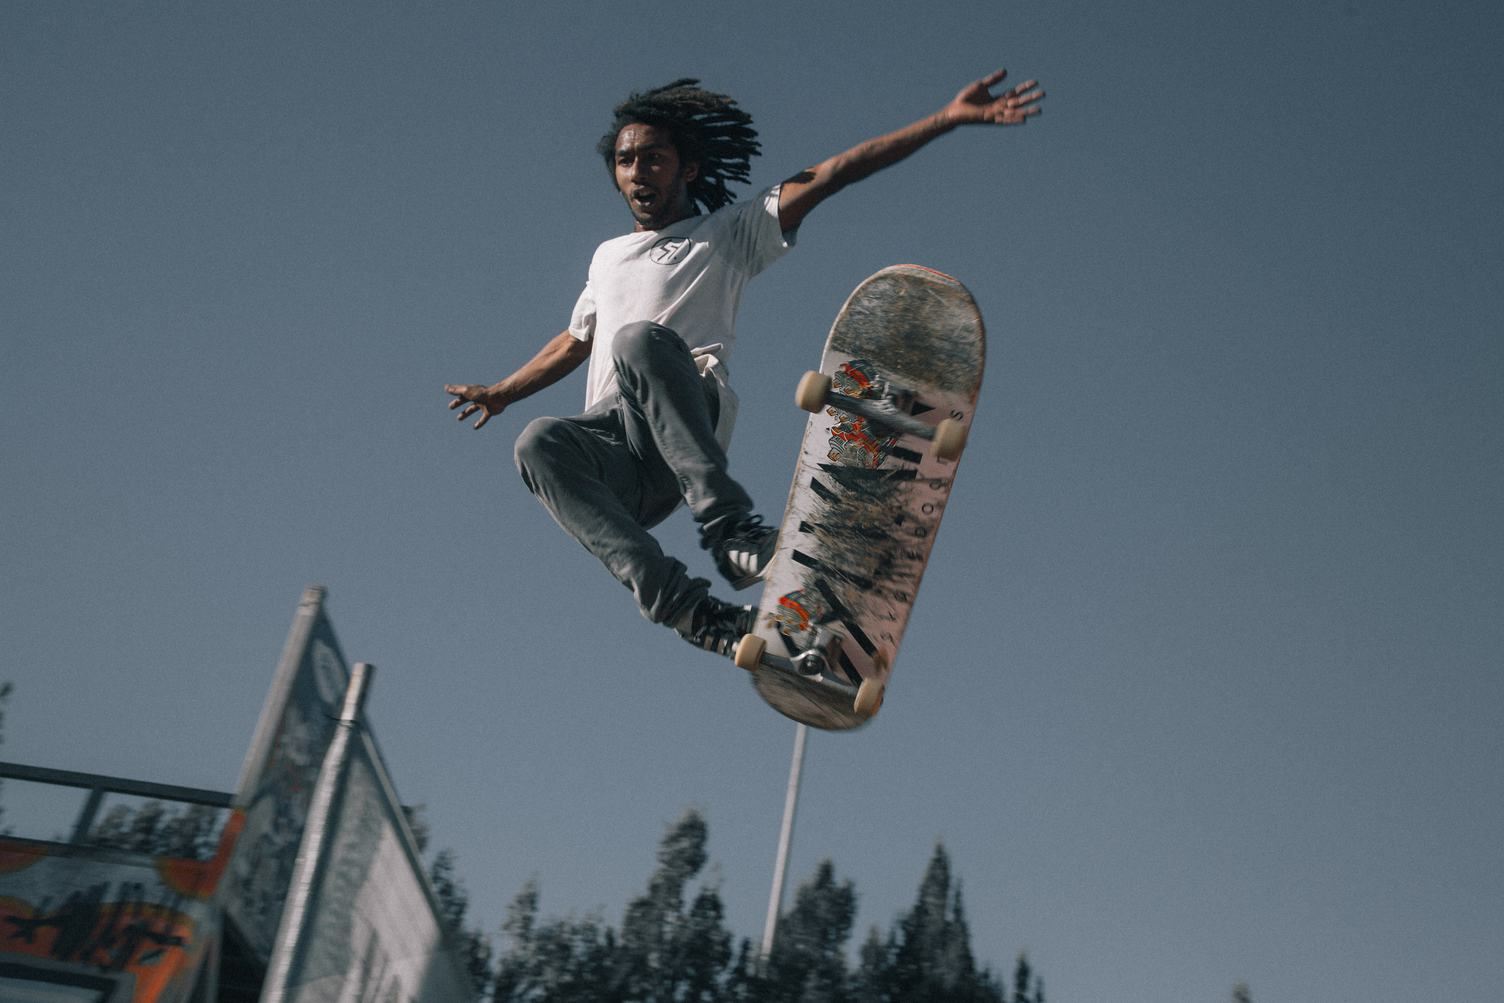 Freedom is Power Skateboarding